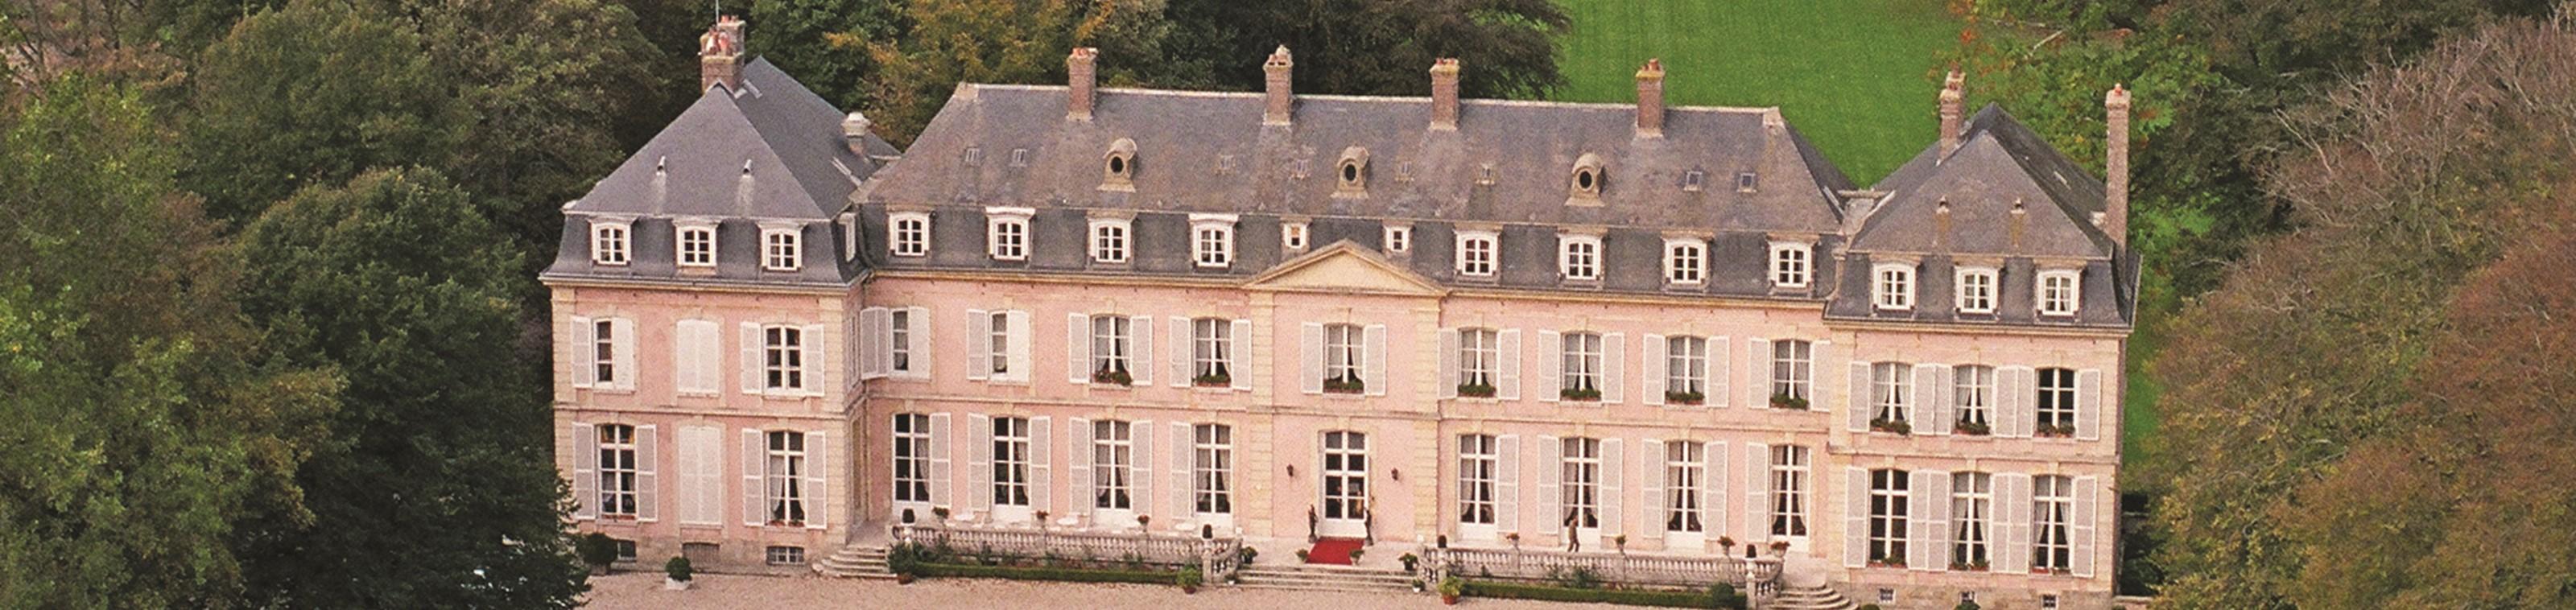 Keizerin Sissi achterna in Normandië: Château de Sissi